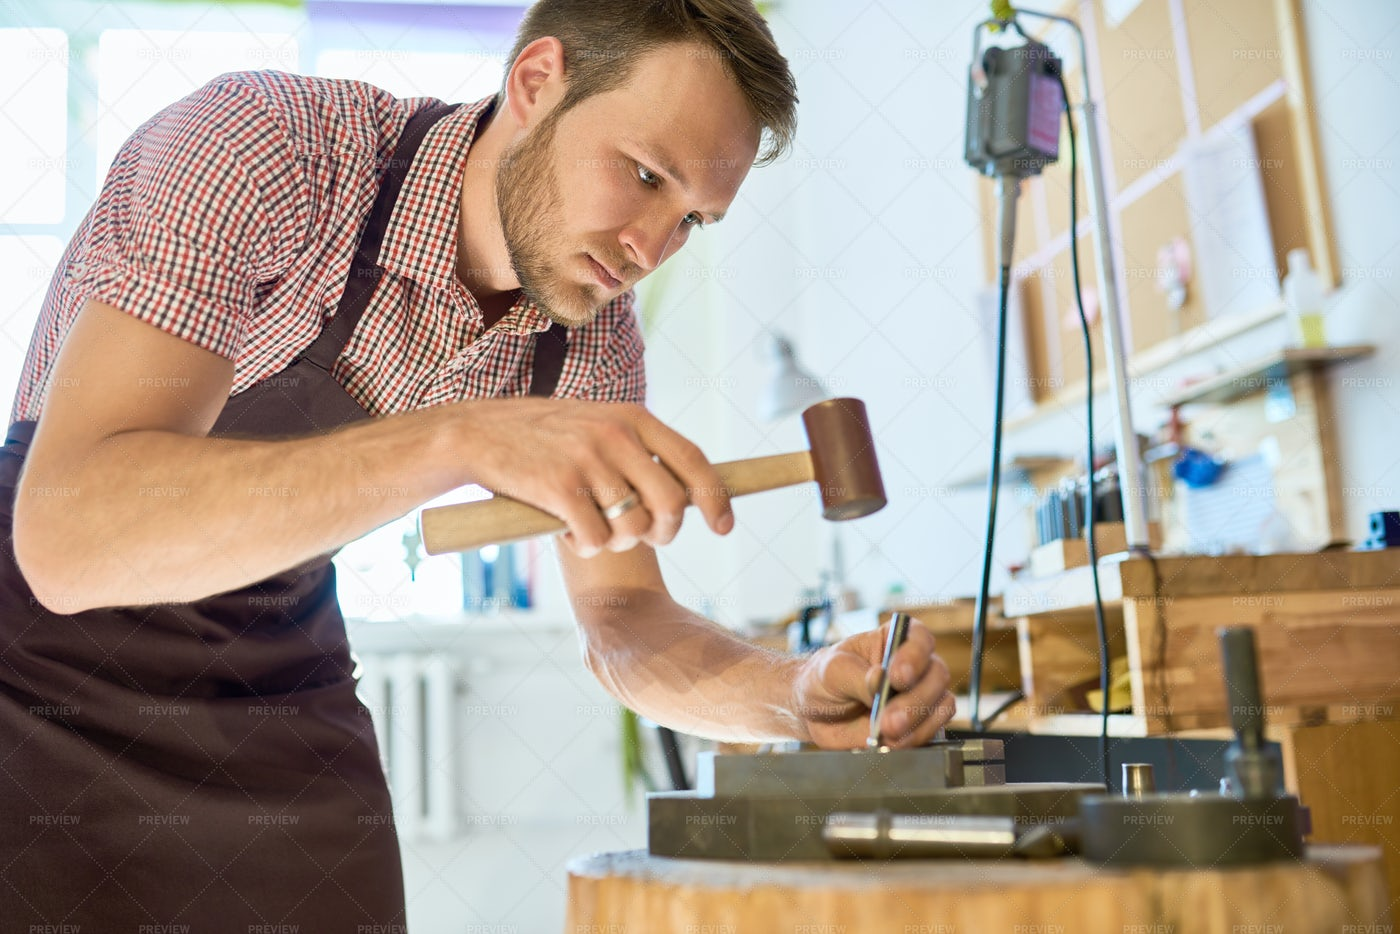 Man Doing Metalwork In Small Studio: Stock Photos